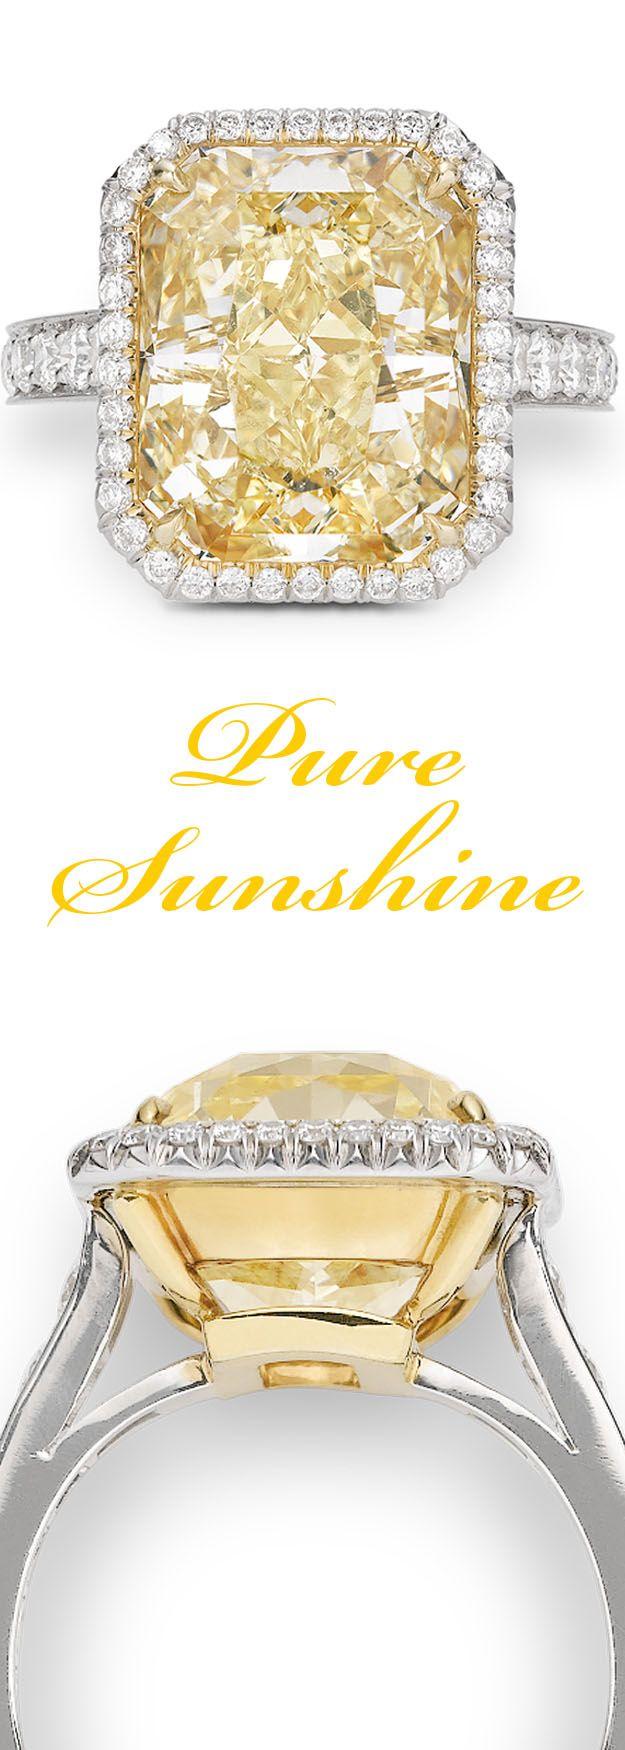 This awe-inspiring 10.21 carat yellow diamond bears the Natural Fancy color grade ~ M.S. Rau Antiques